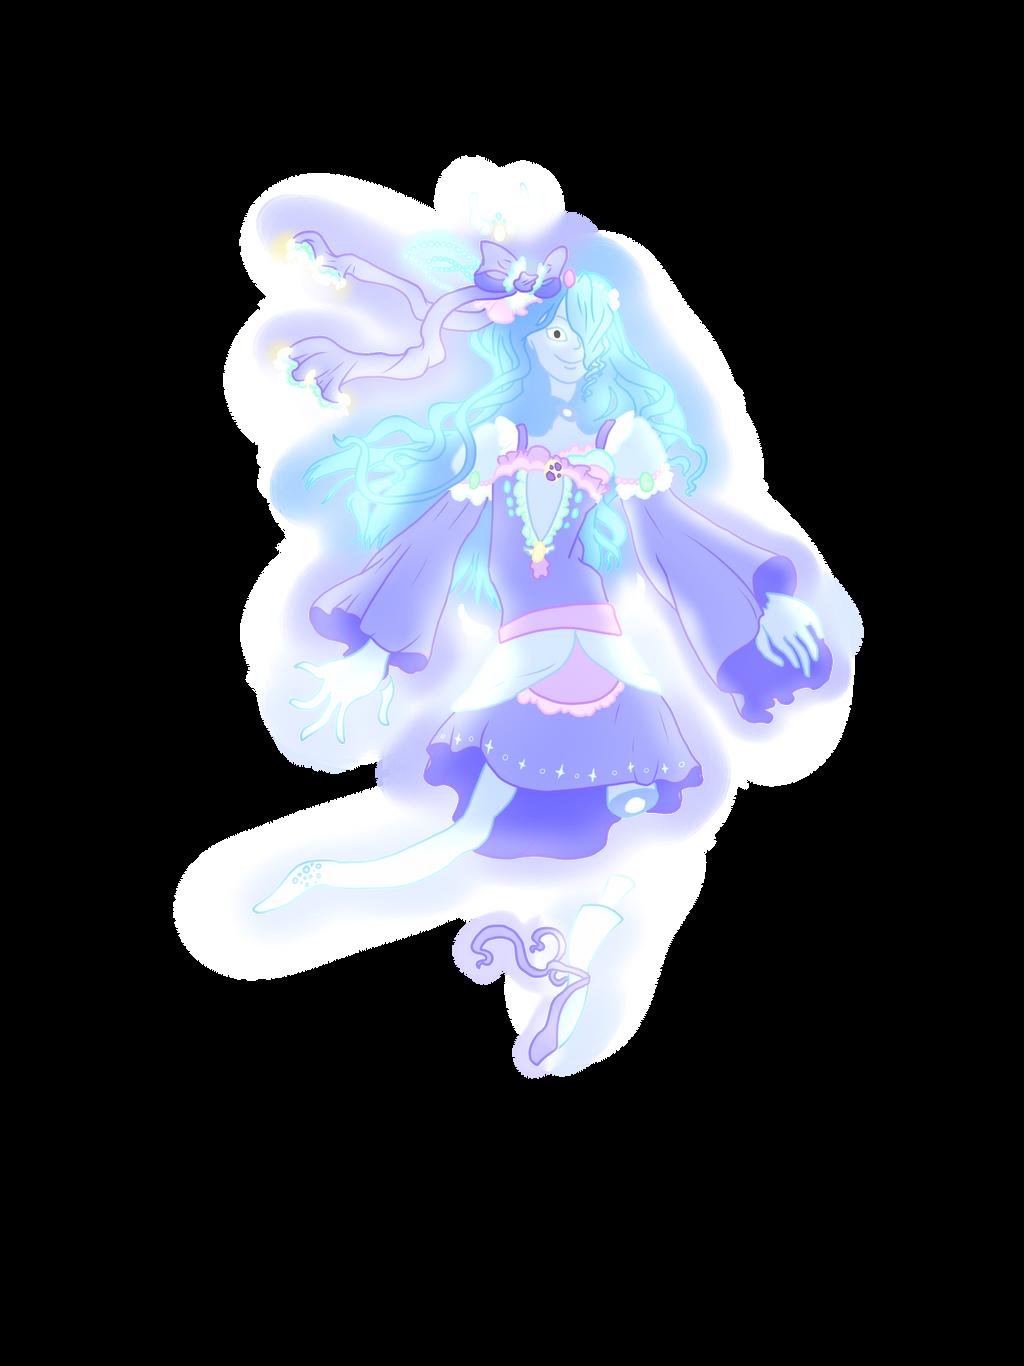 Ghost magical girl